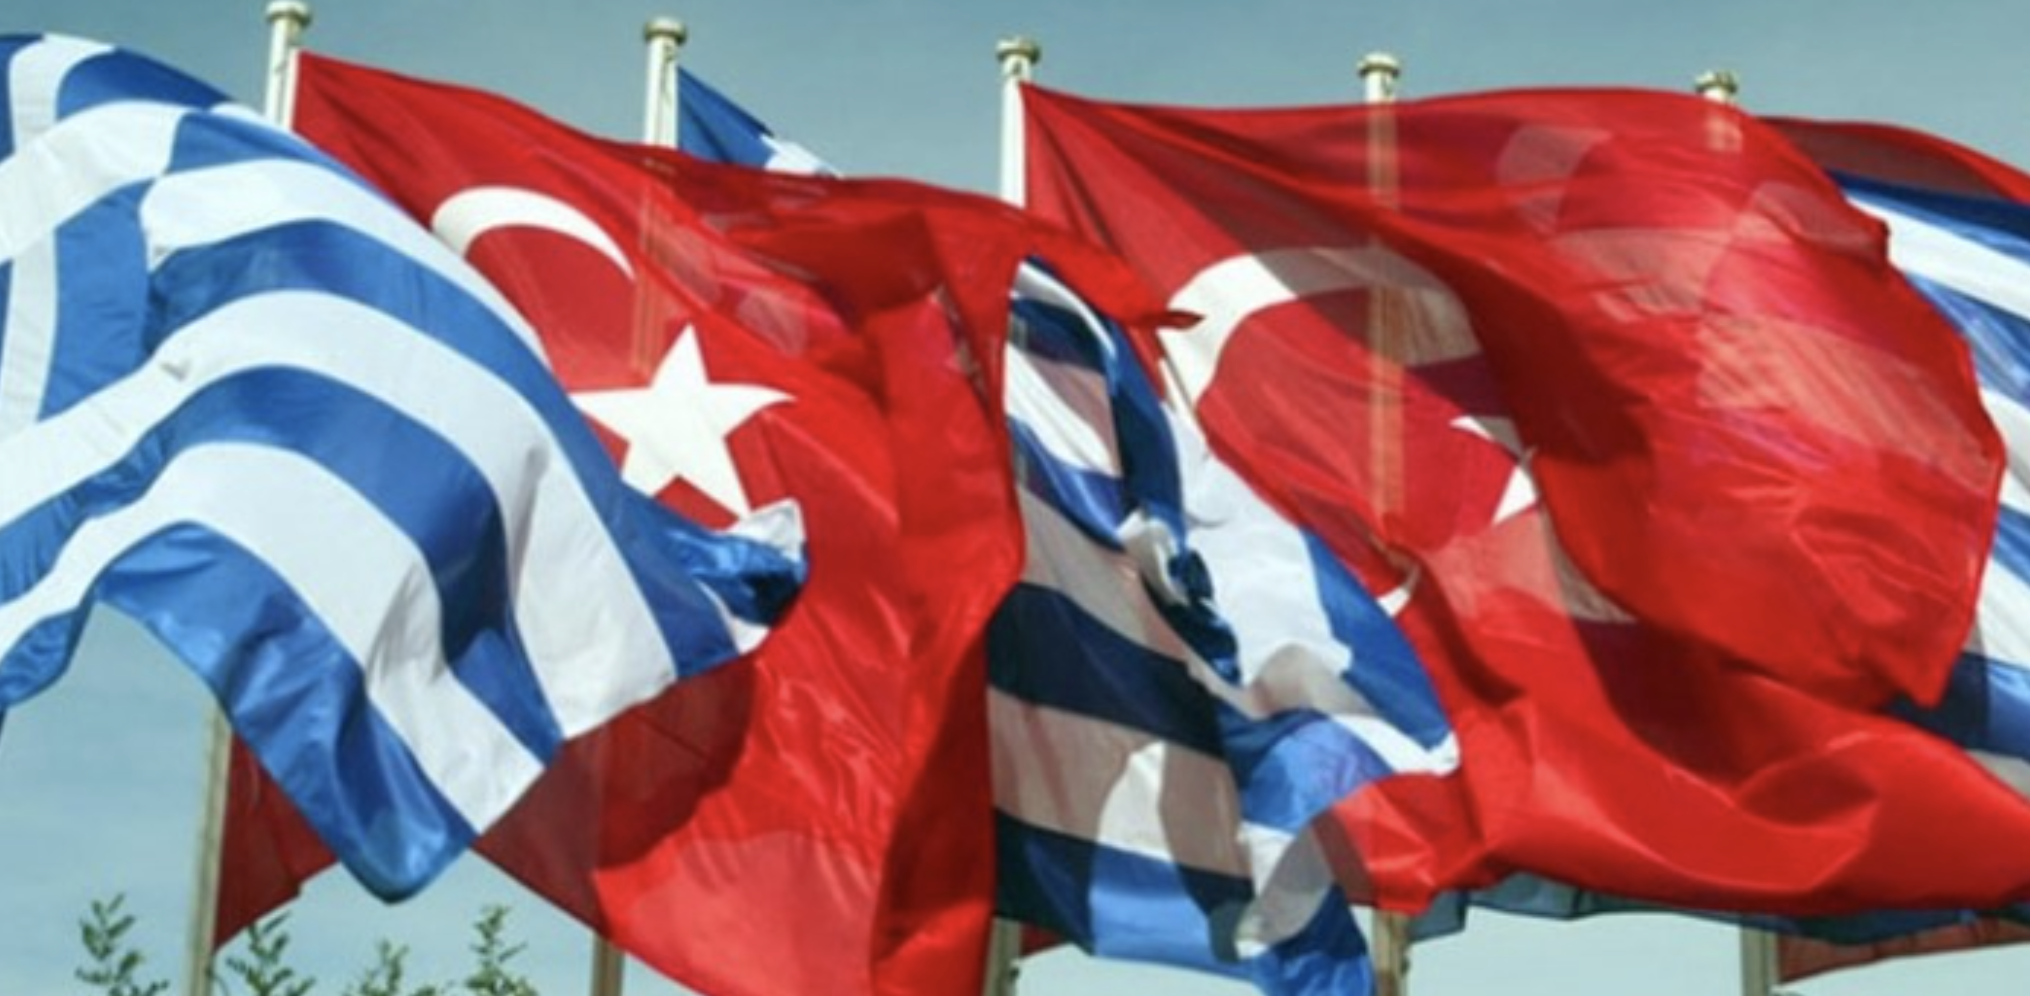 The 63rd round of Greece-Turkey exploratory talks on 6 October in Ankara